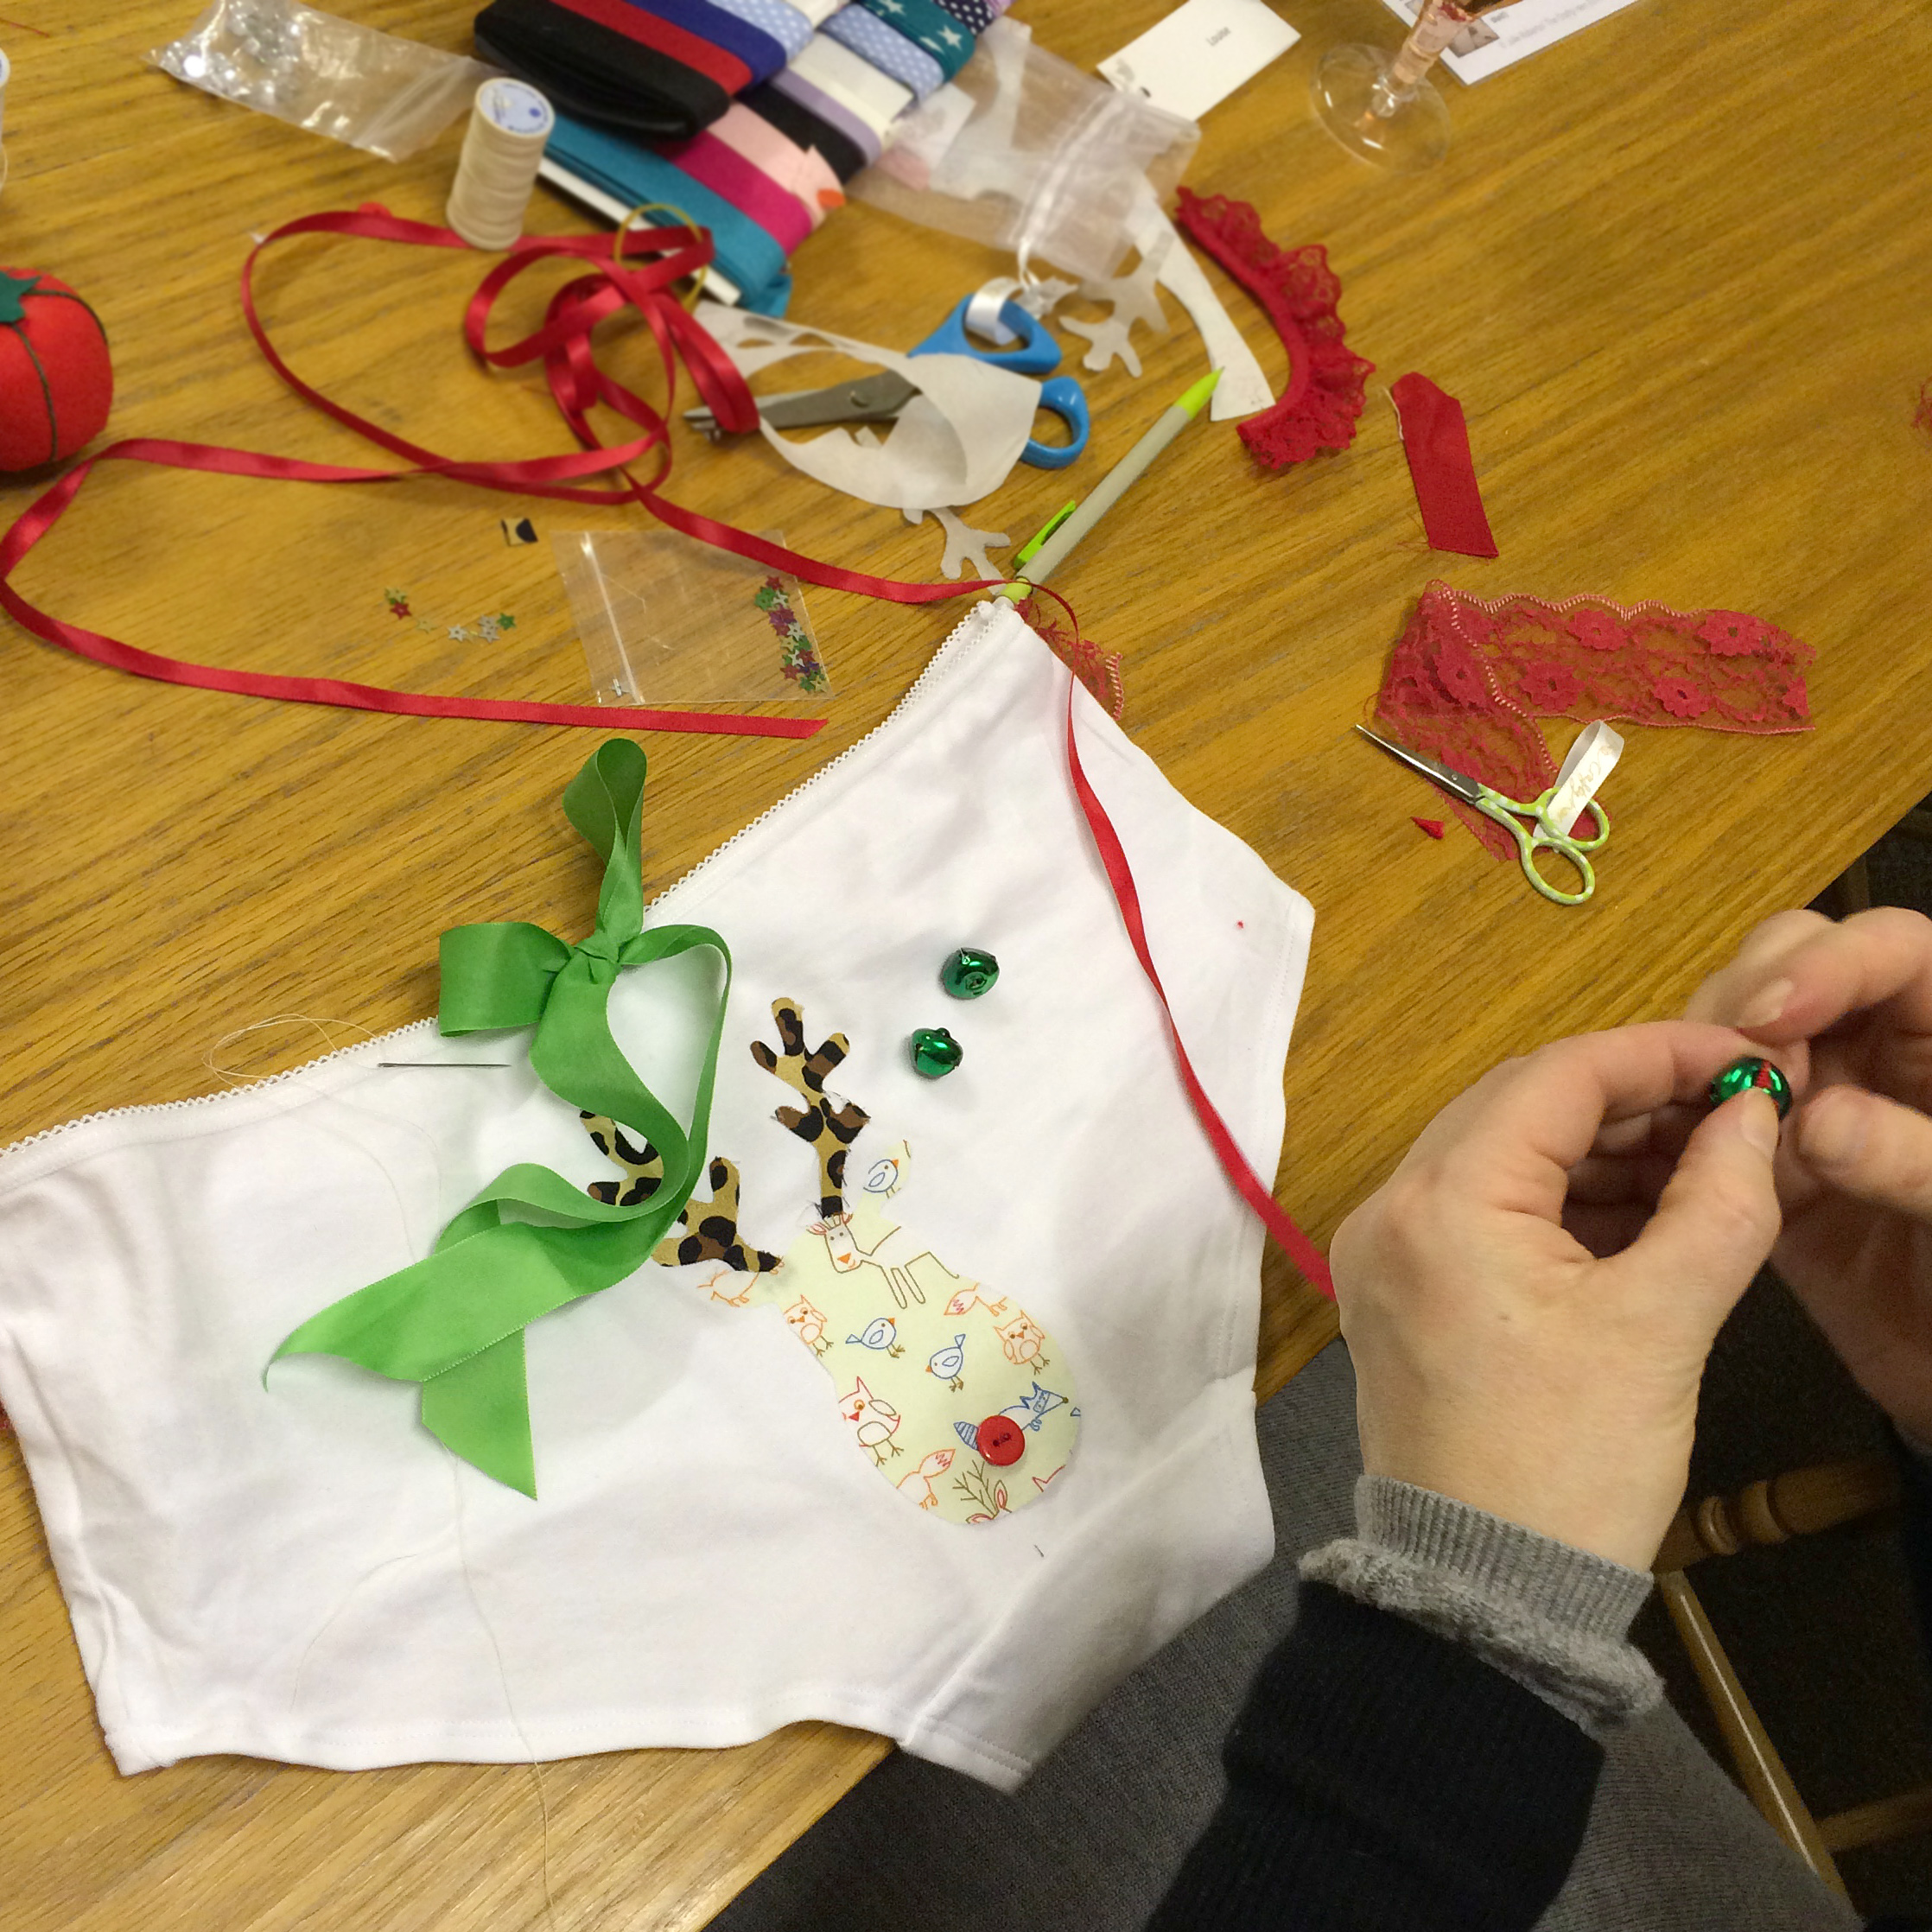 Christmas Knicker Making The Crafty Hen.jpeg